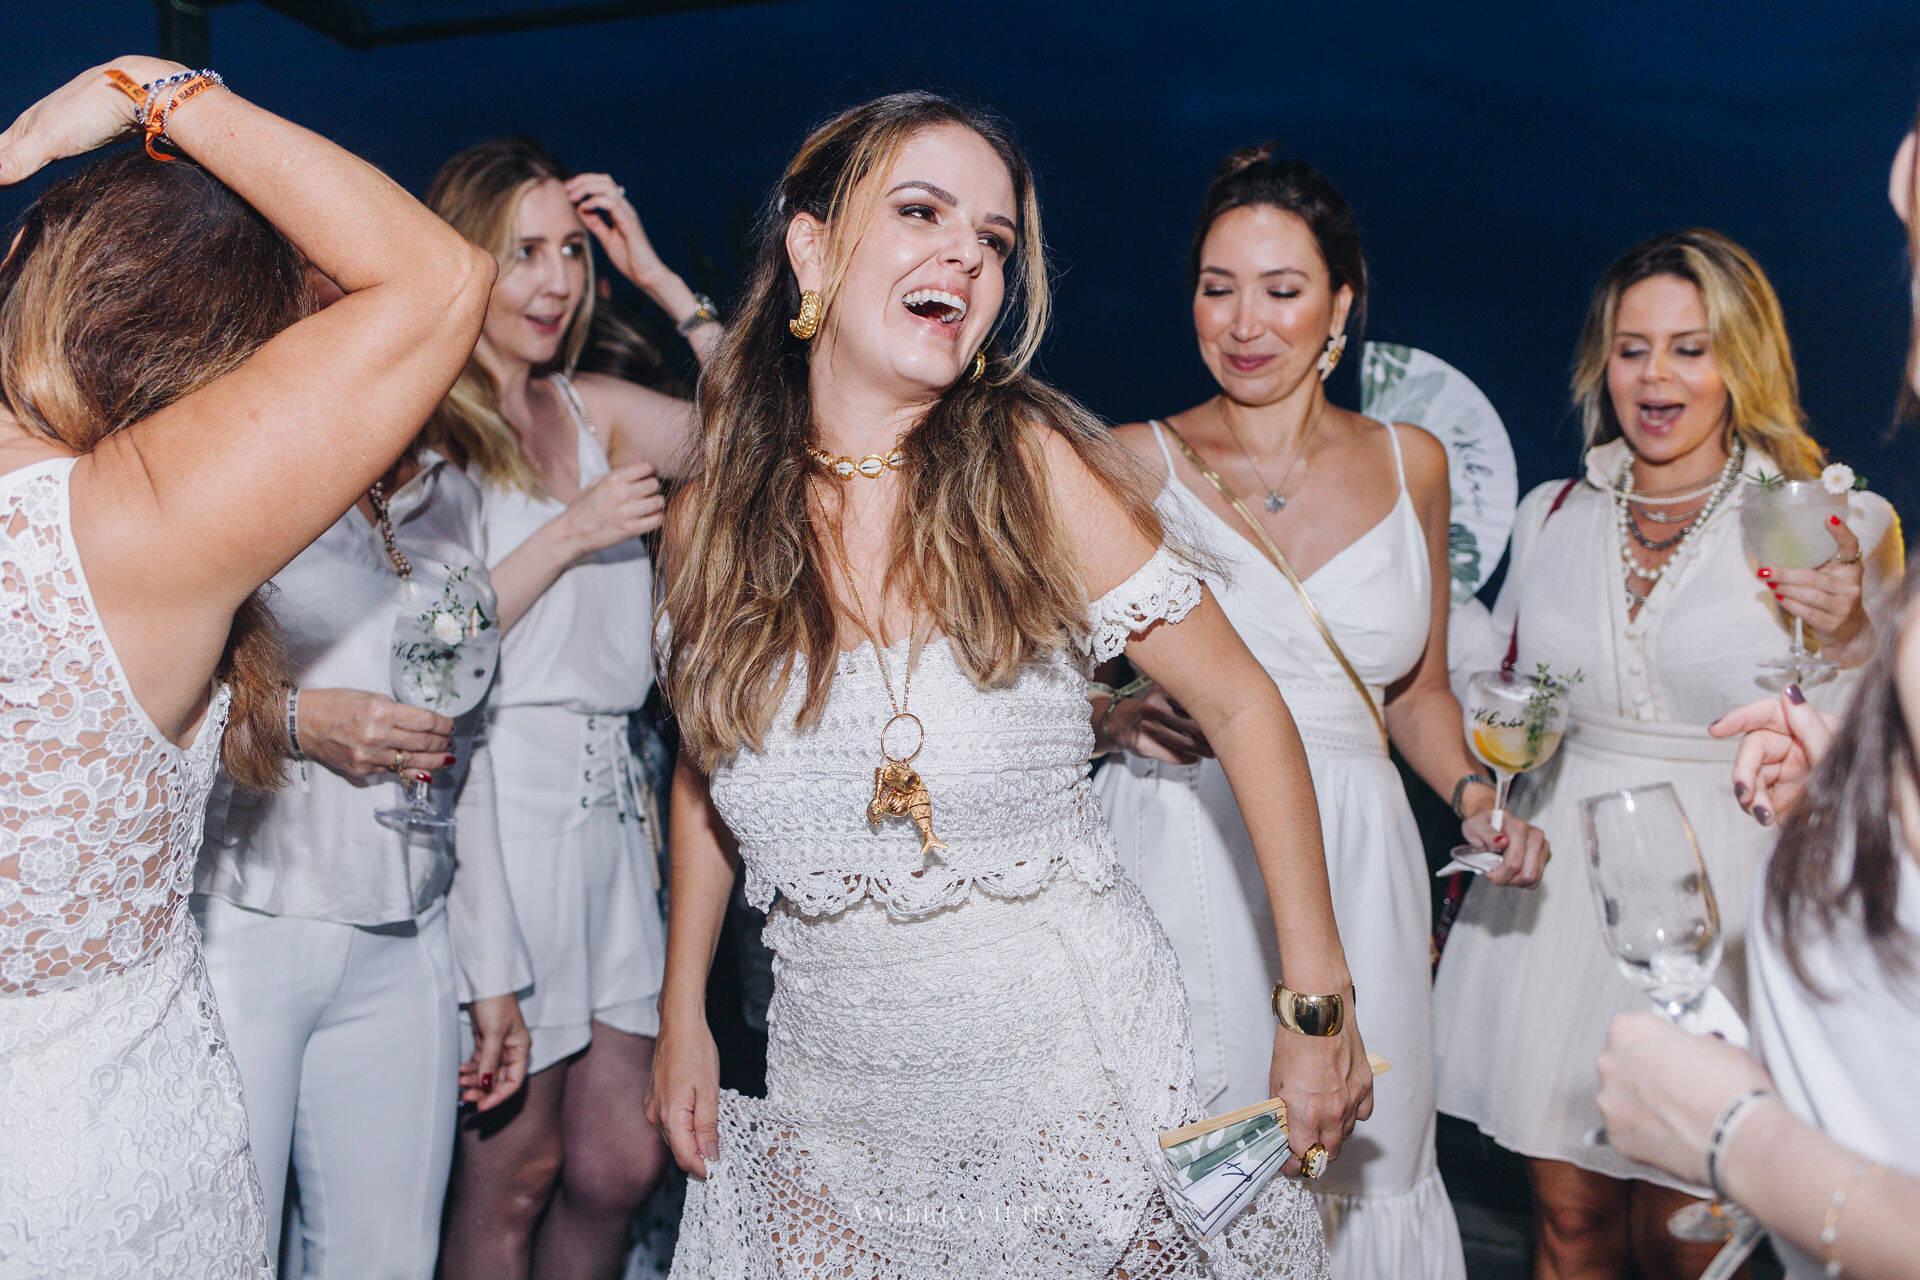 Kika Cavalcanti com amigas na pista dança /Foto: Mariama Prieto